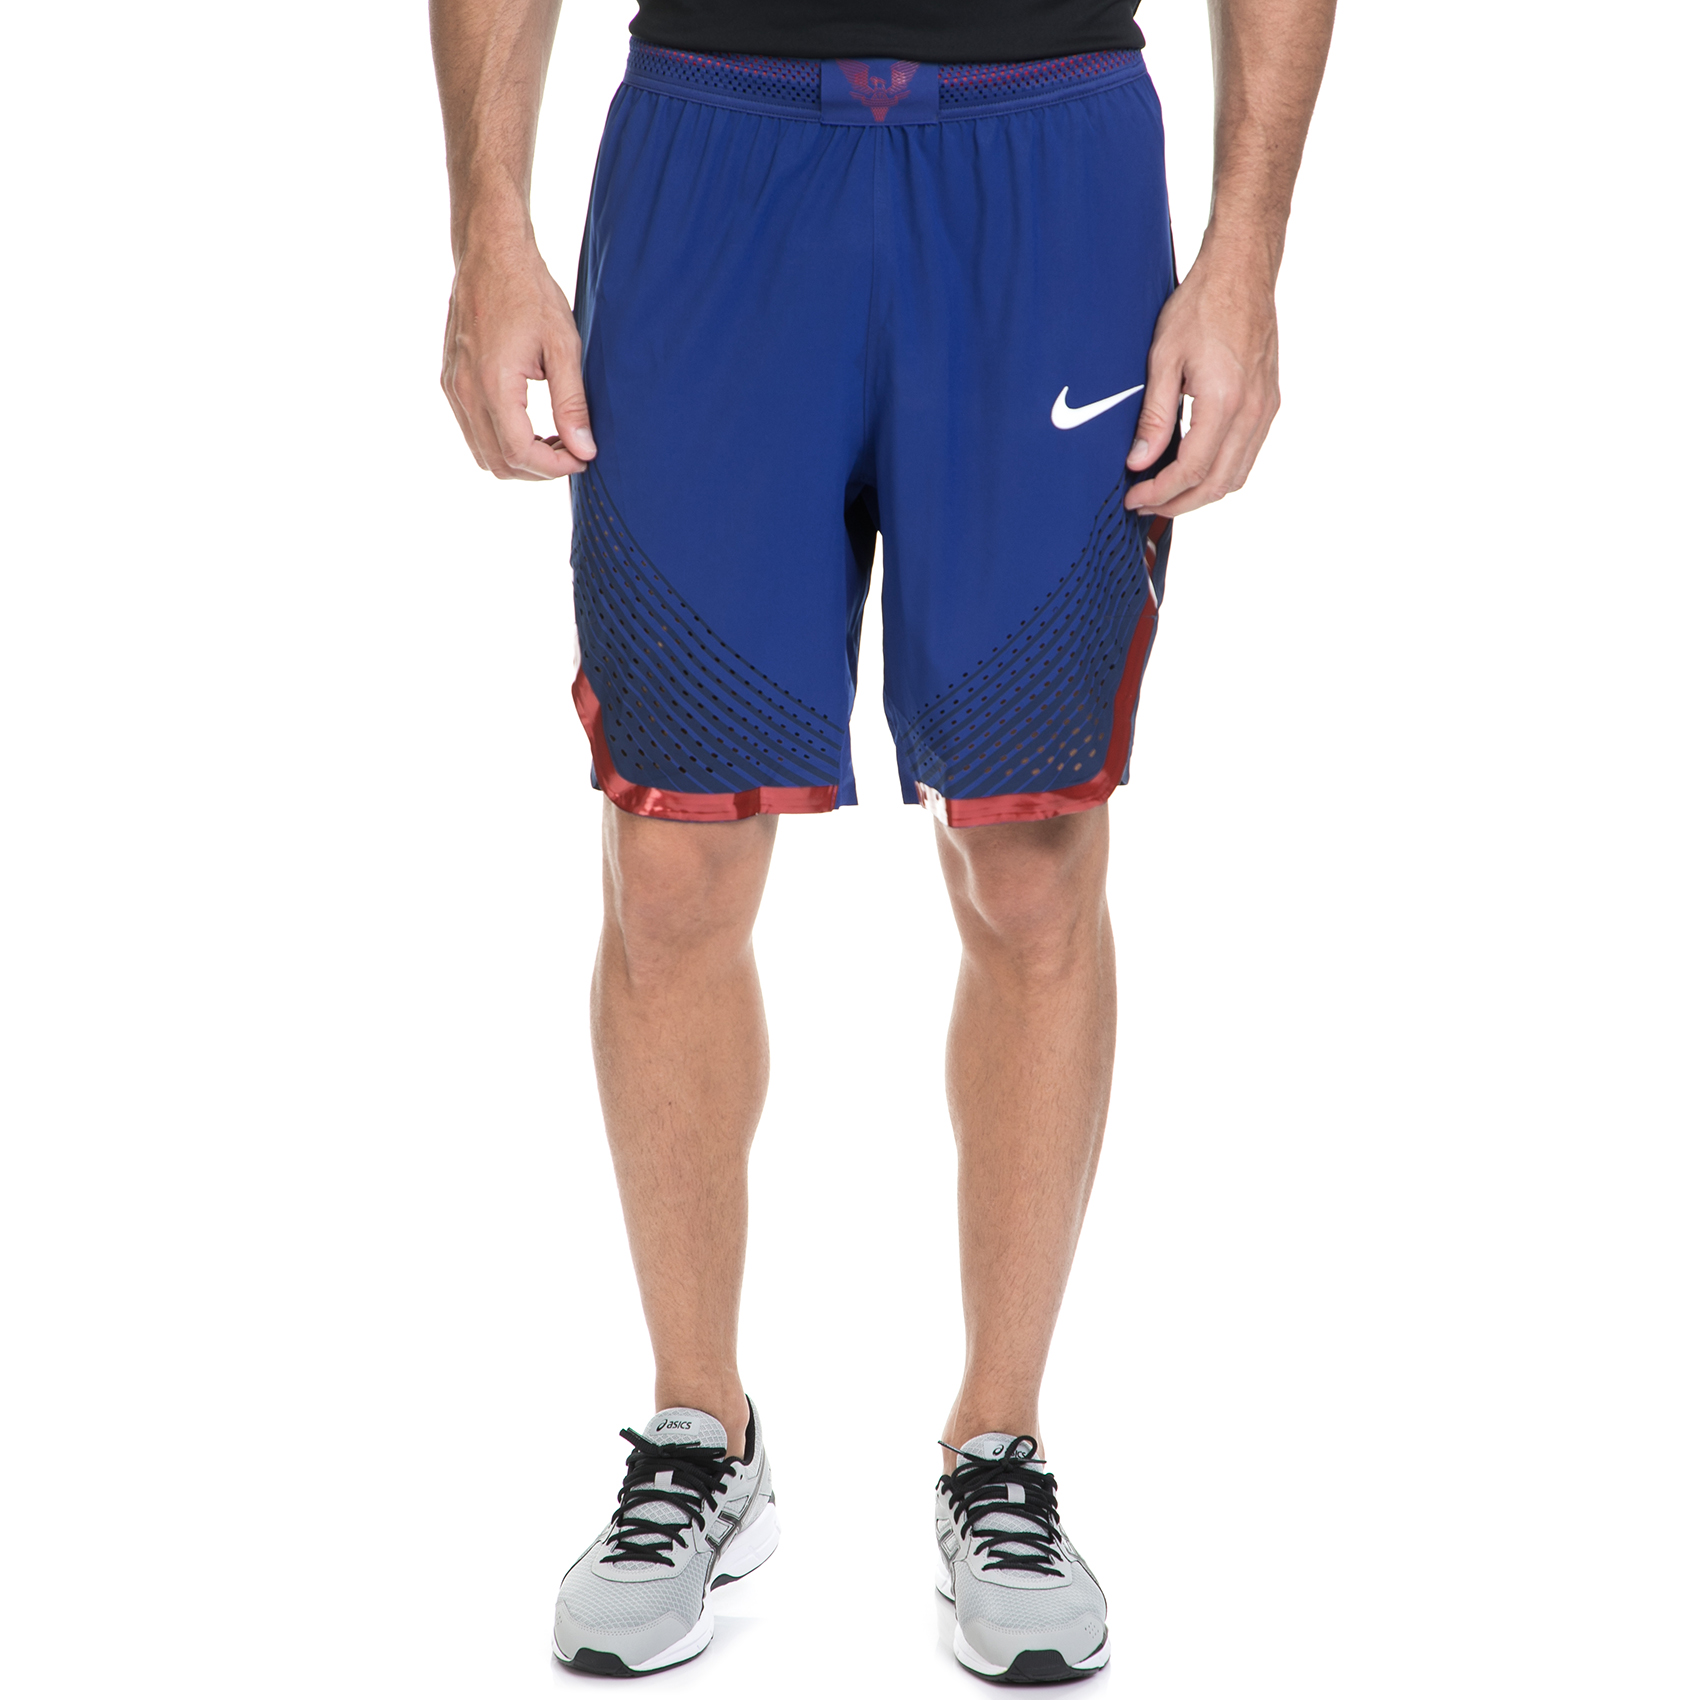 NIKE - Ανδρική αθλητική βερμούδα ΝΙΚΕ USA M NK AROSWFT HPRELT μπλε ανδρικά ρούχα σορτς βερμούδες αθλητικά